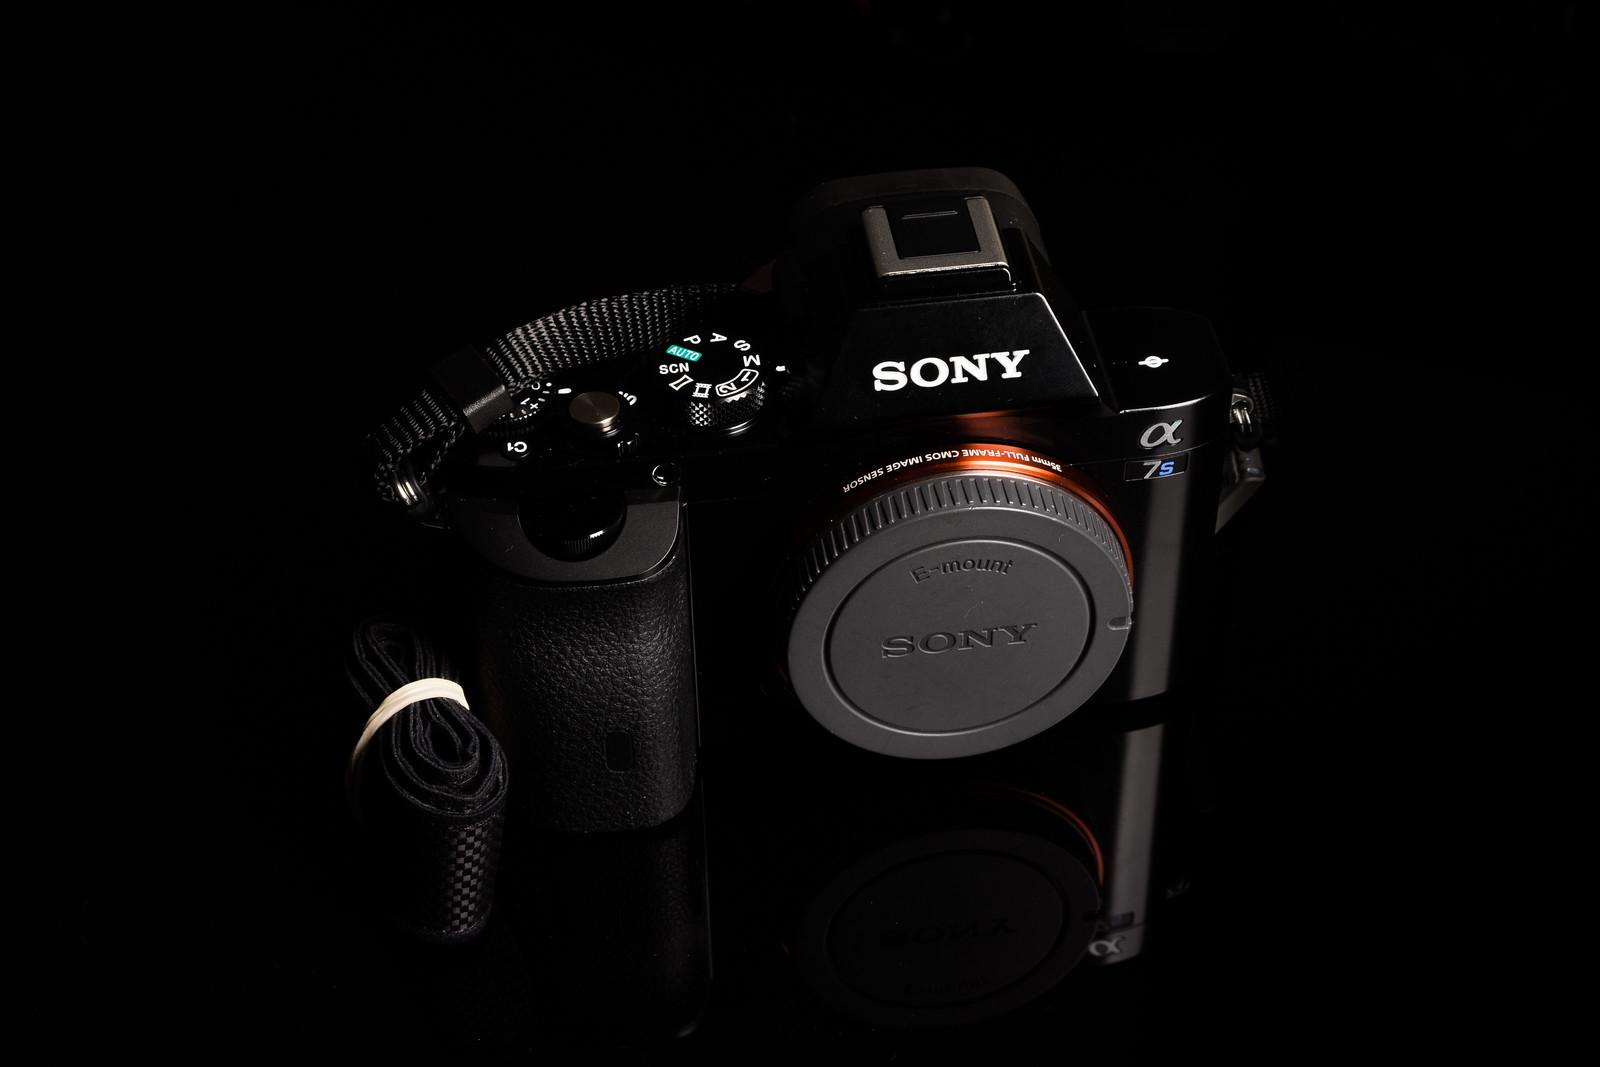 4k not working in Sony Camera